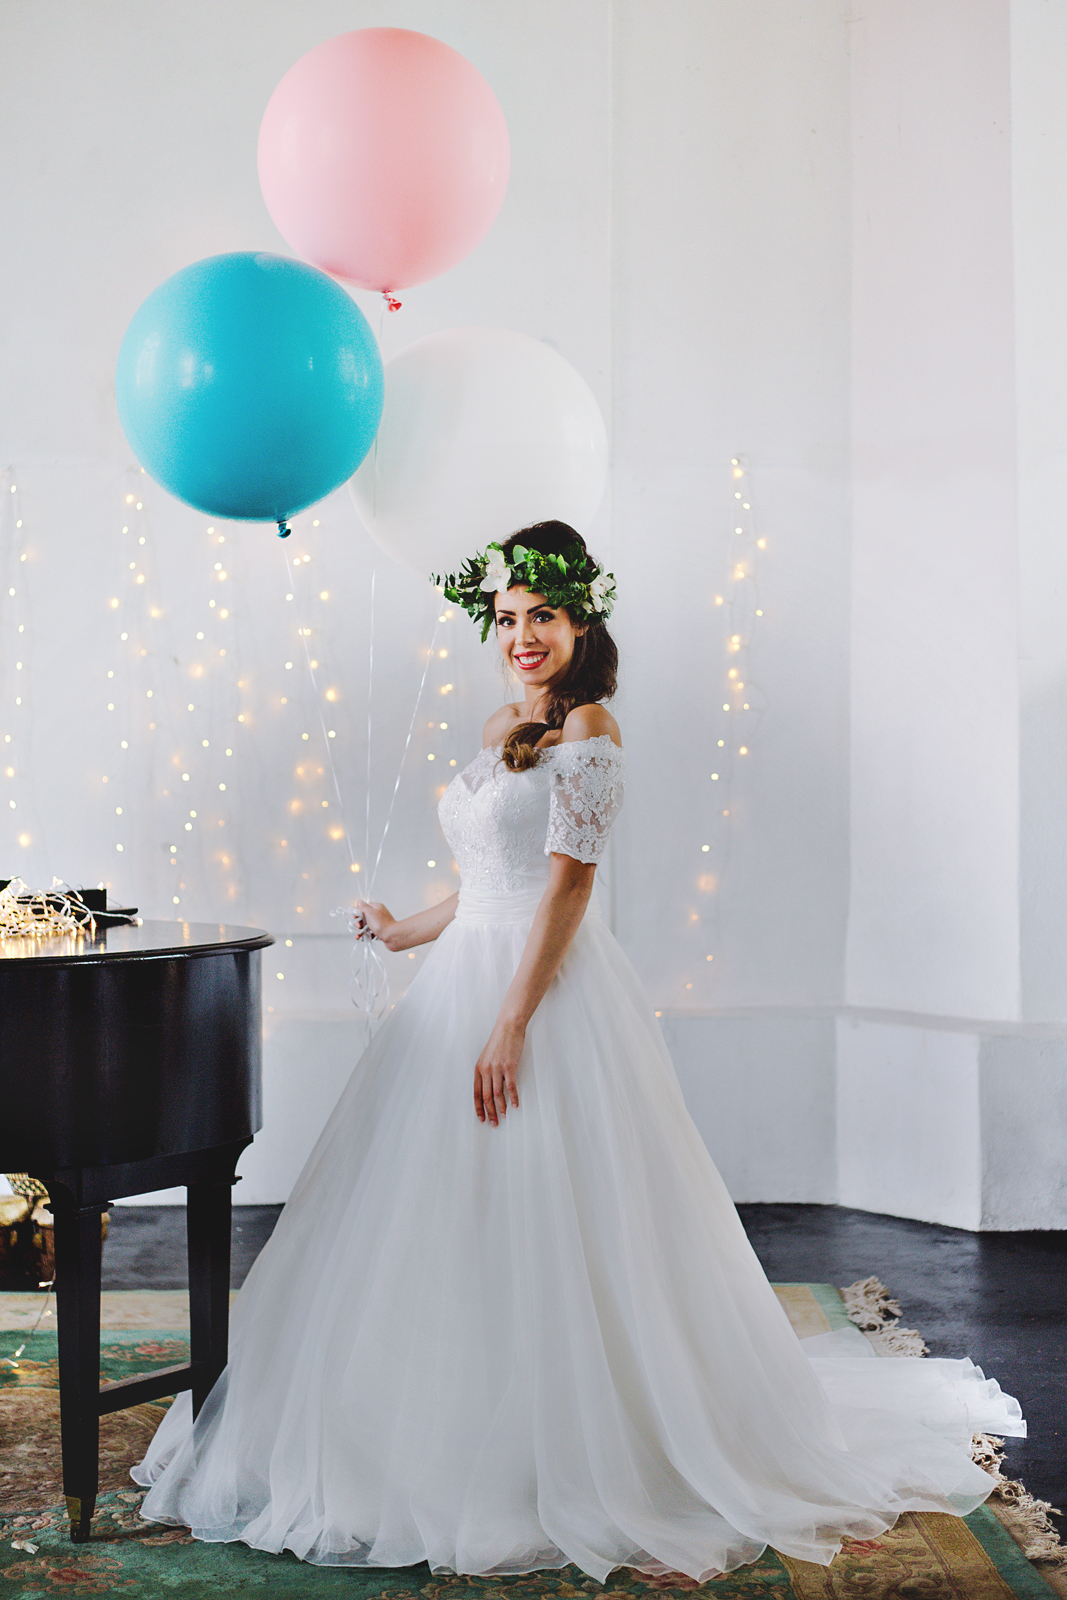 norfolk_wedding_photographer _norwich_anglia_documentary_reportage_storybook (16).jpg